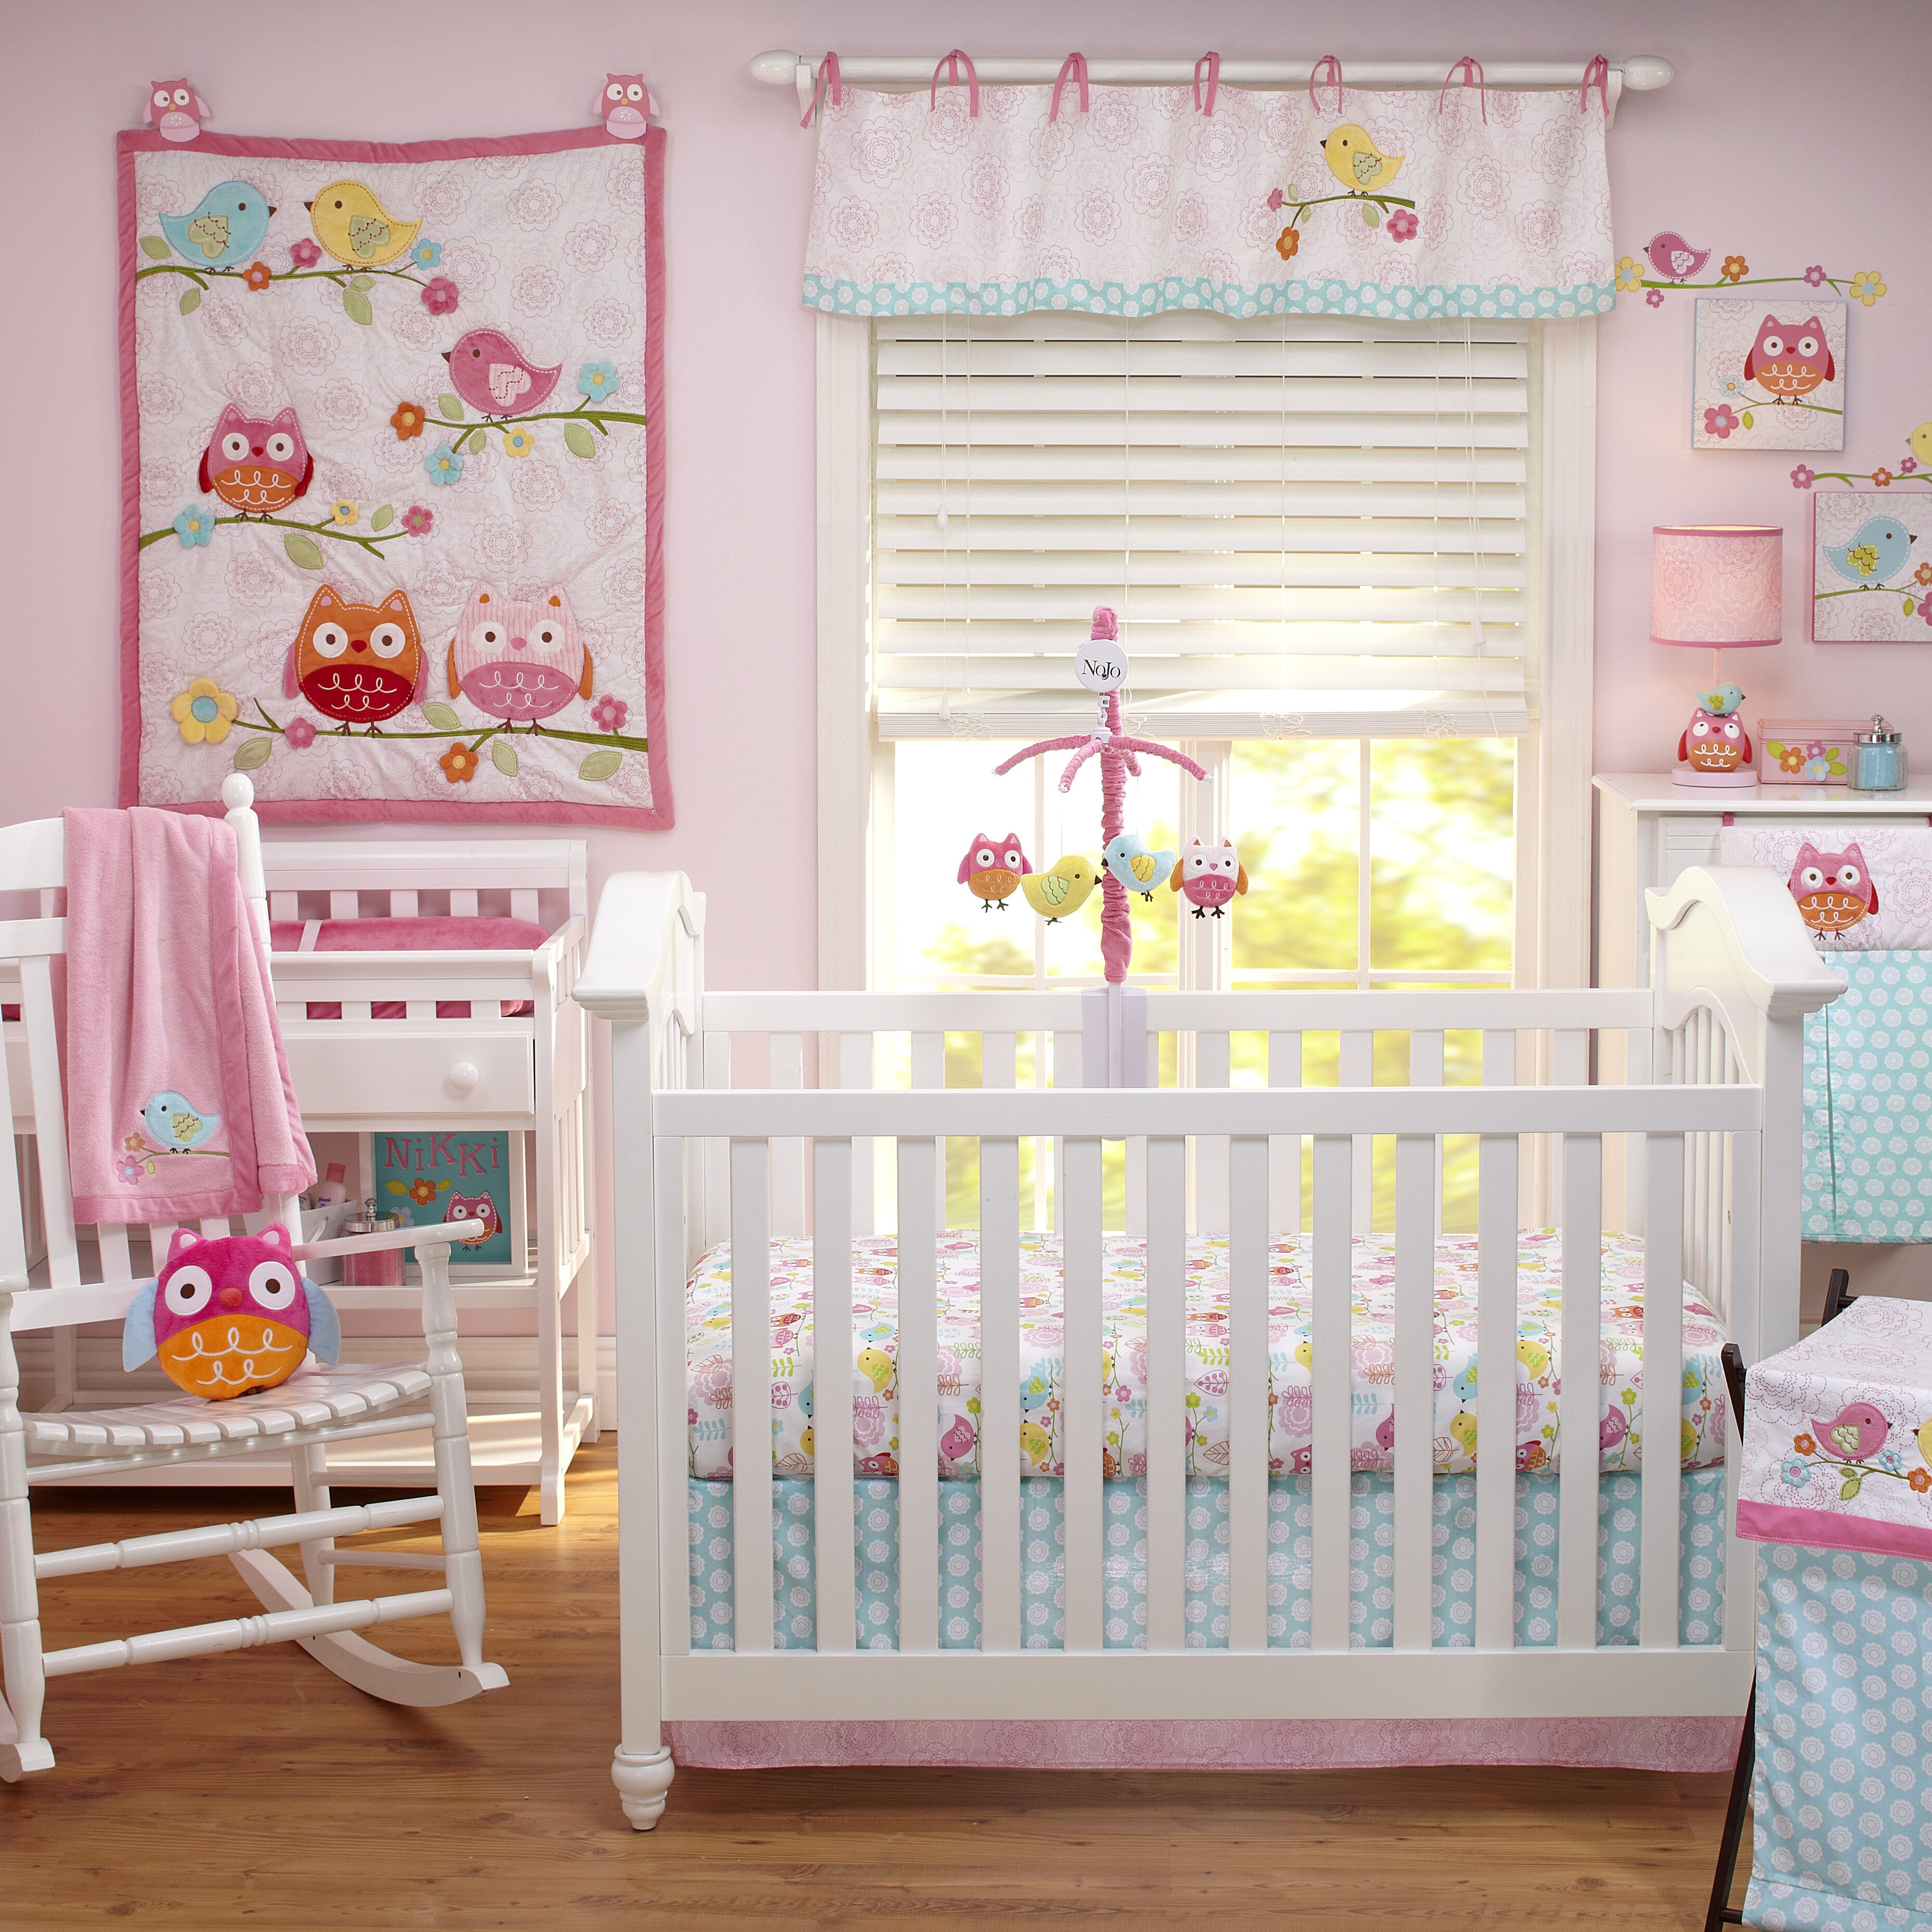 Baby cribs lubbock tx - Nojo Love Bird 4 Piece Crib Bedding Set